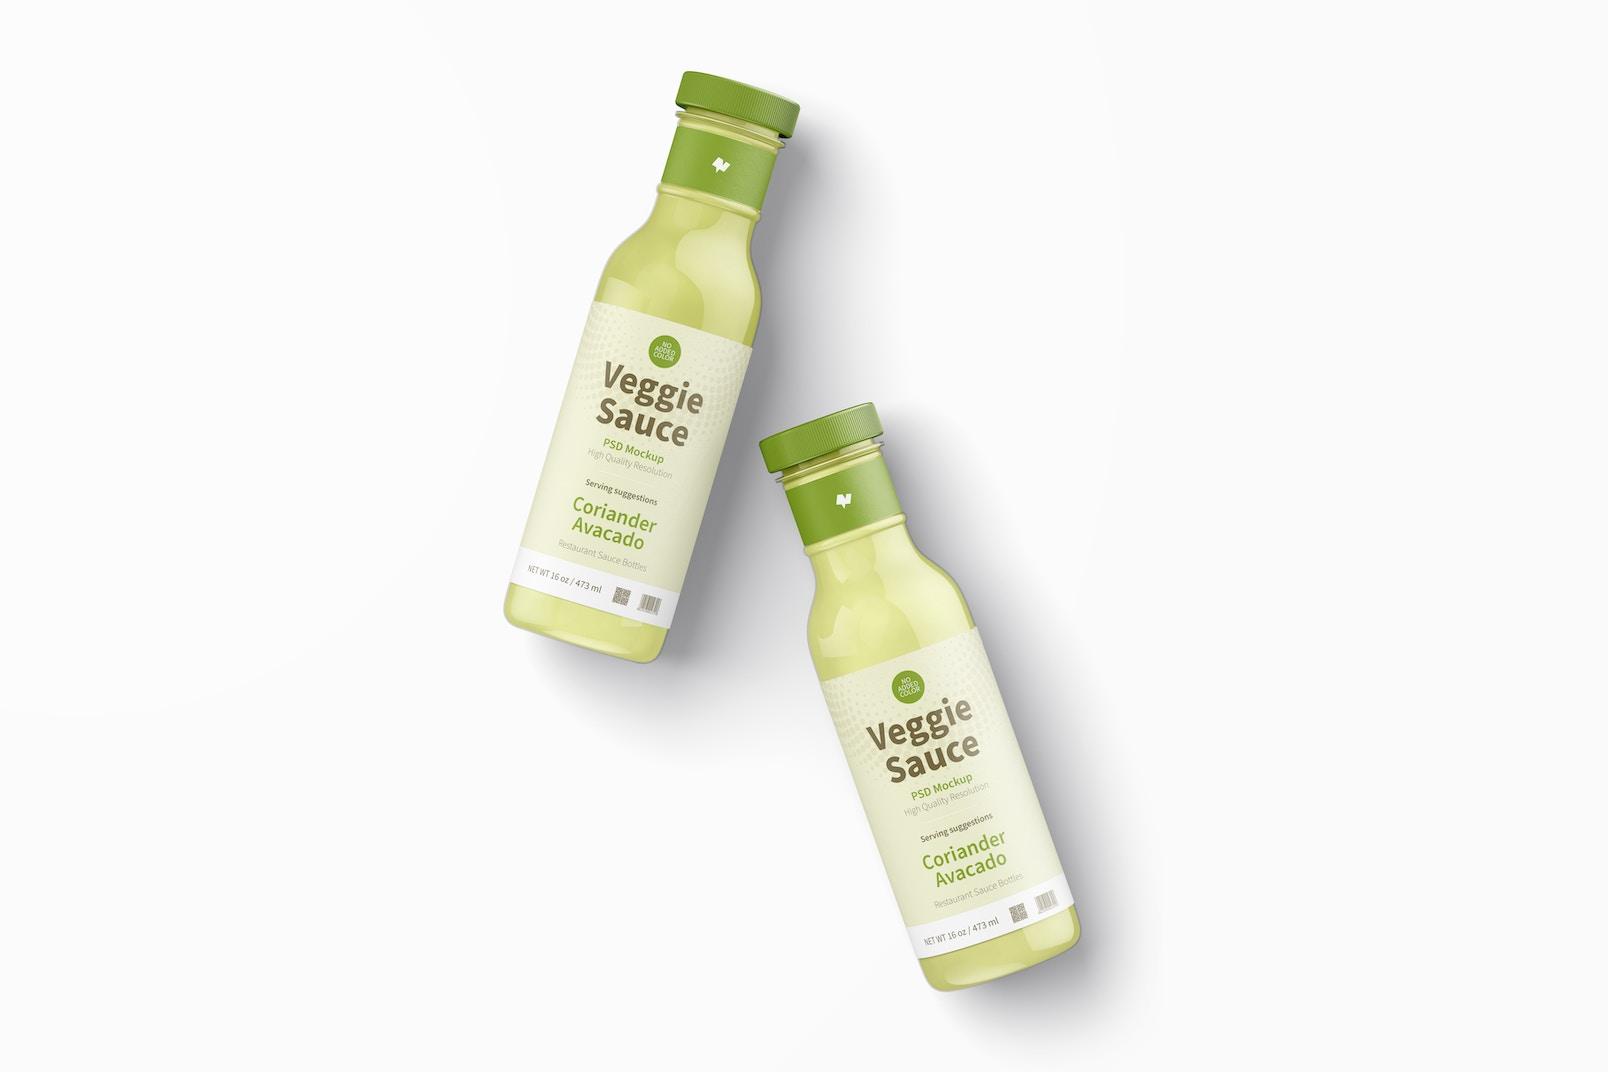 12 oz Veggie Sauce Bottle Mockup, Top View